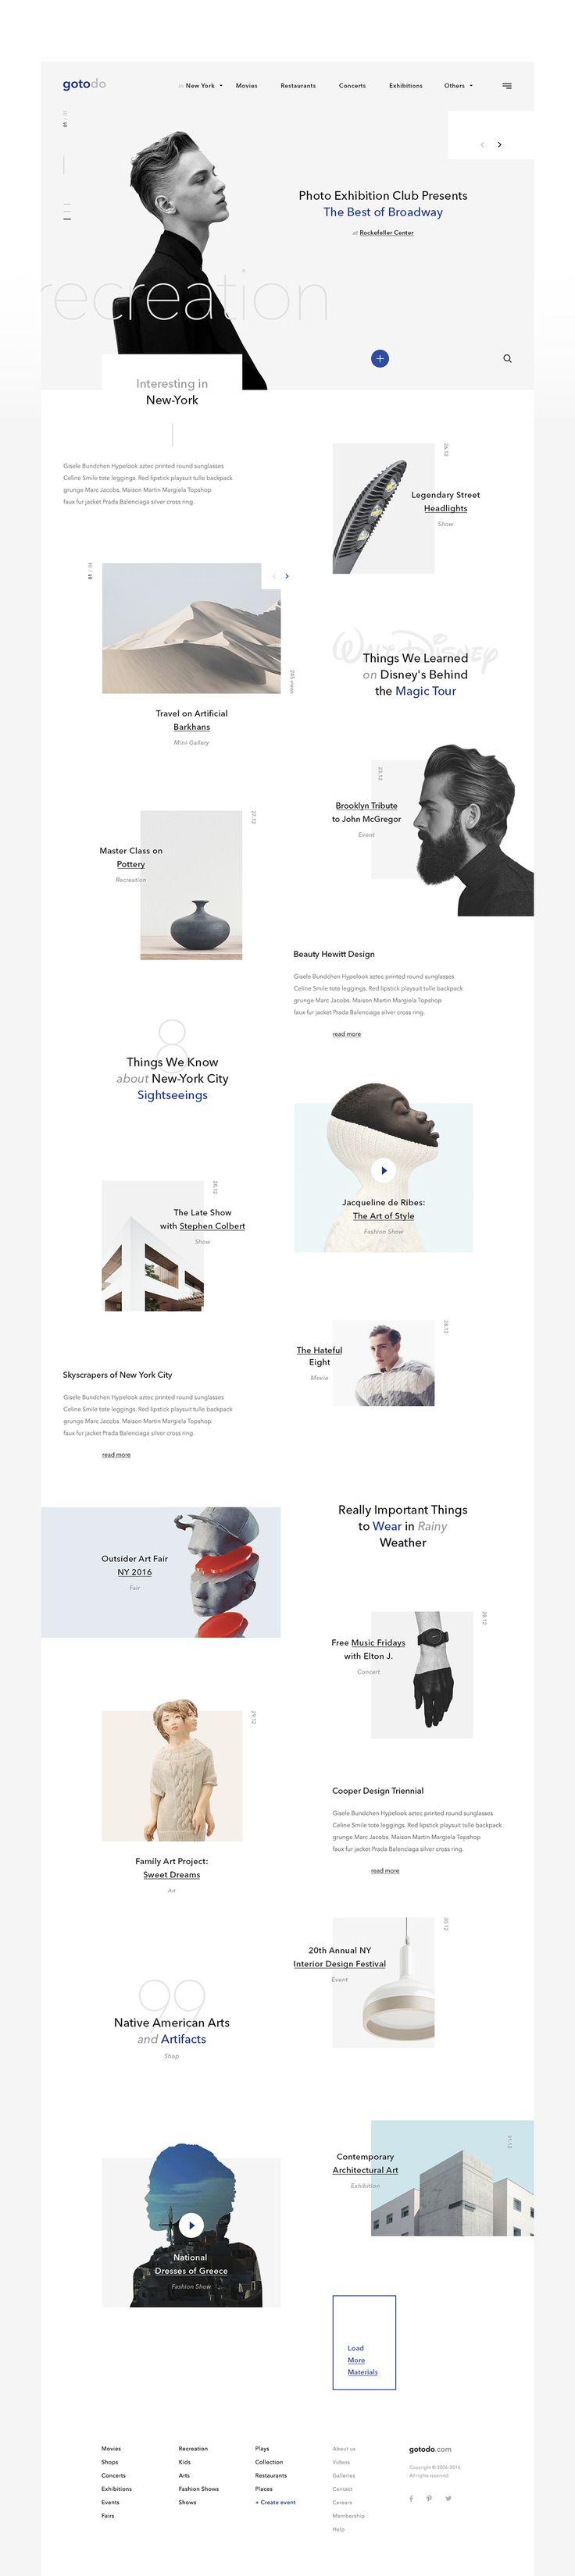 Gotodo on Web Design Served